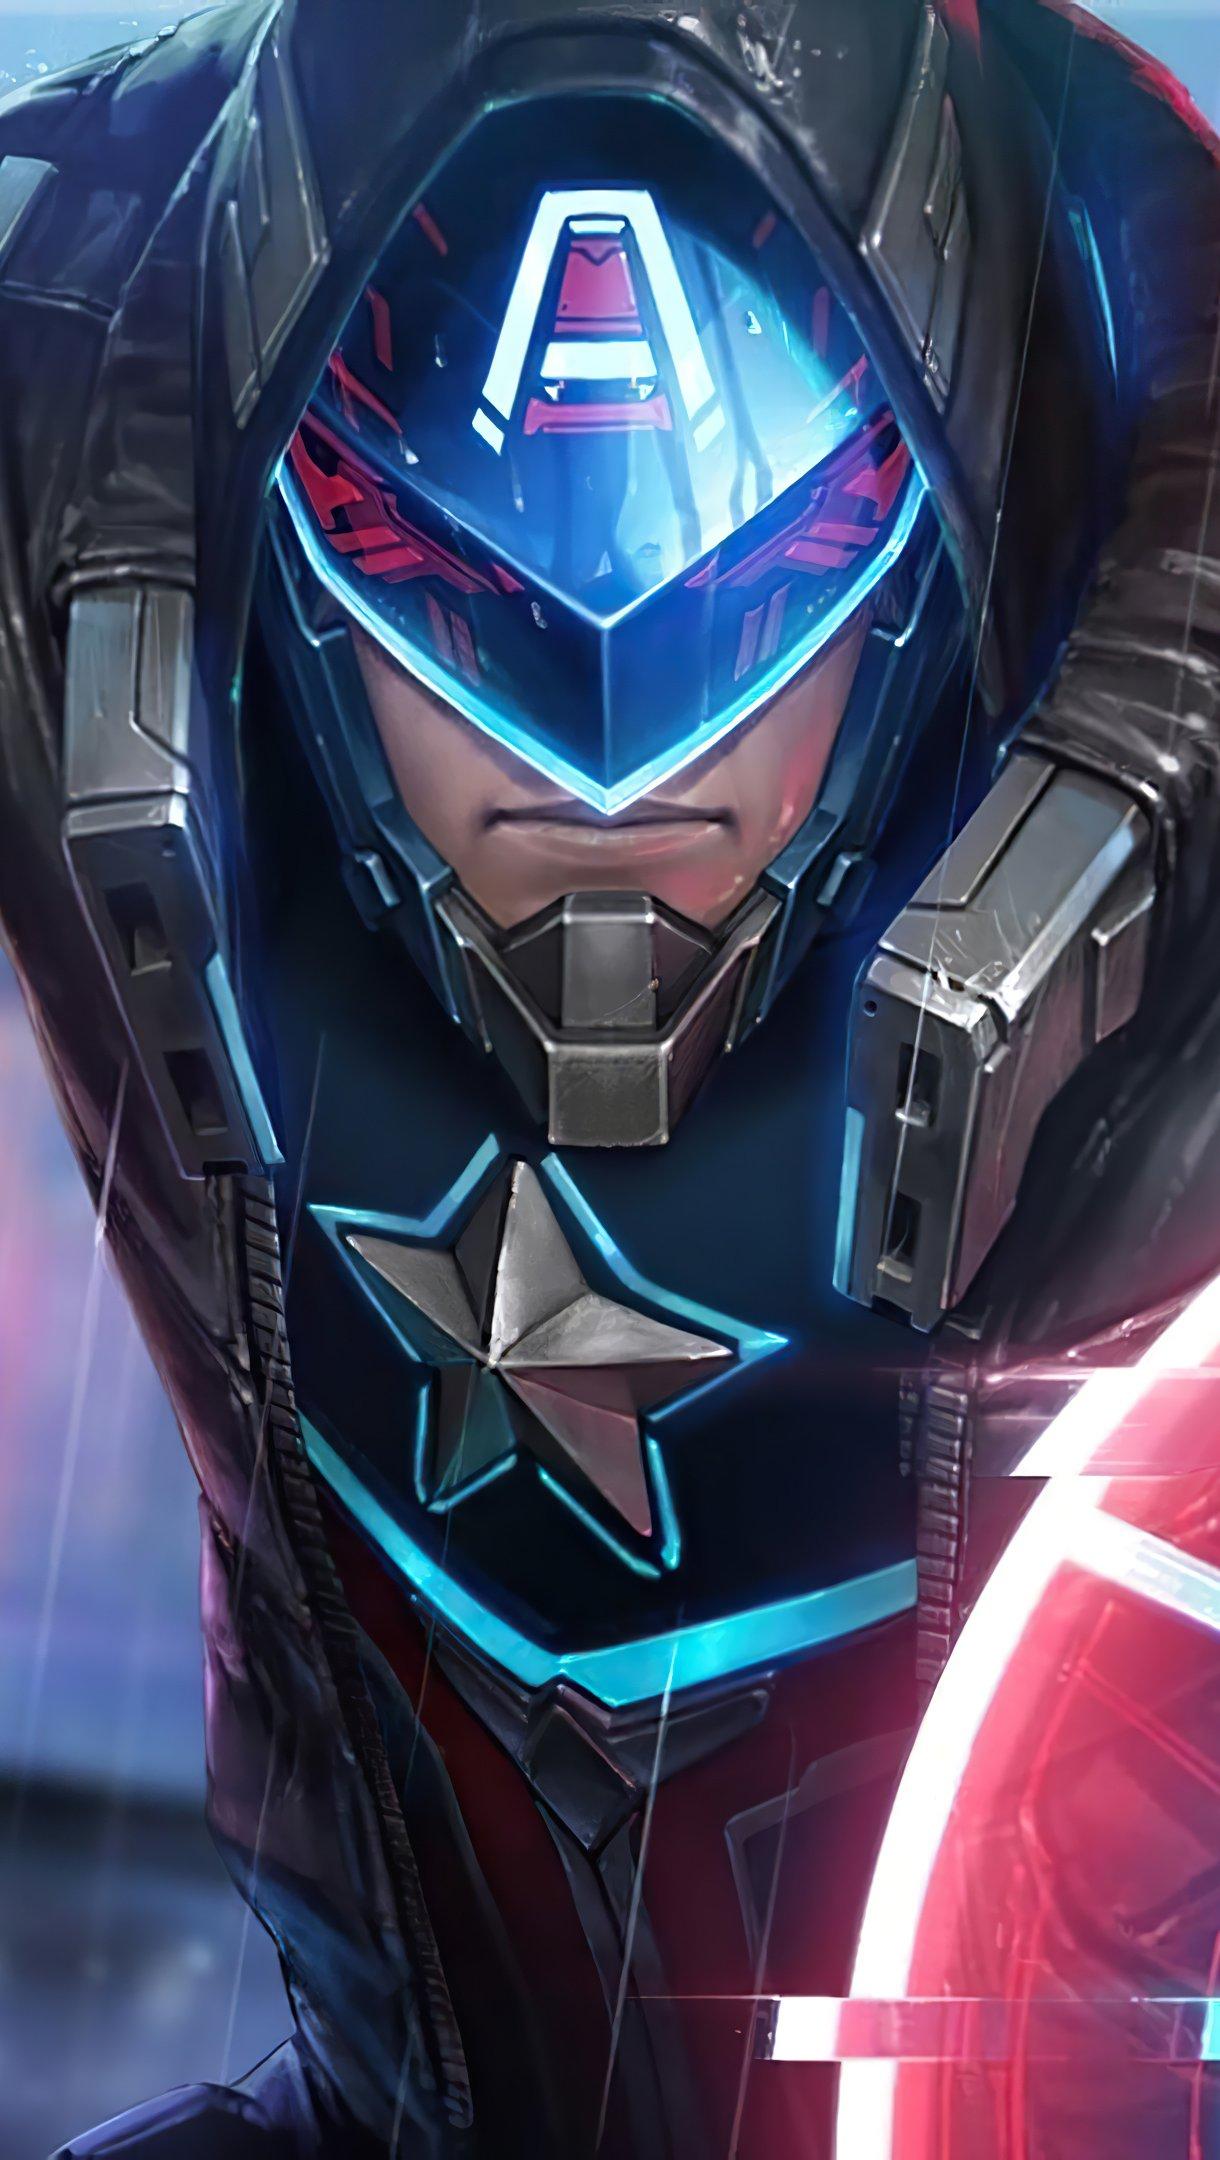 Fondos de pantalla Capitan America Future Fight Vertical